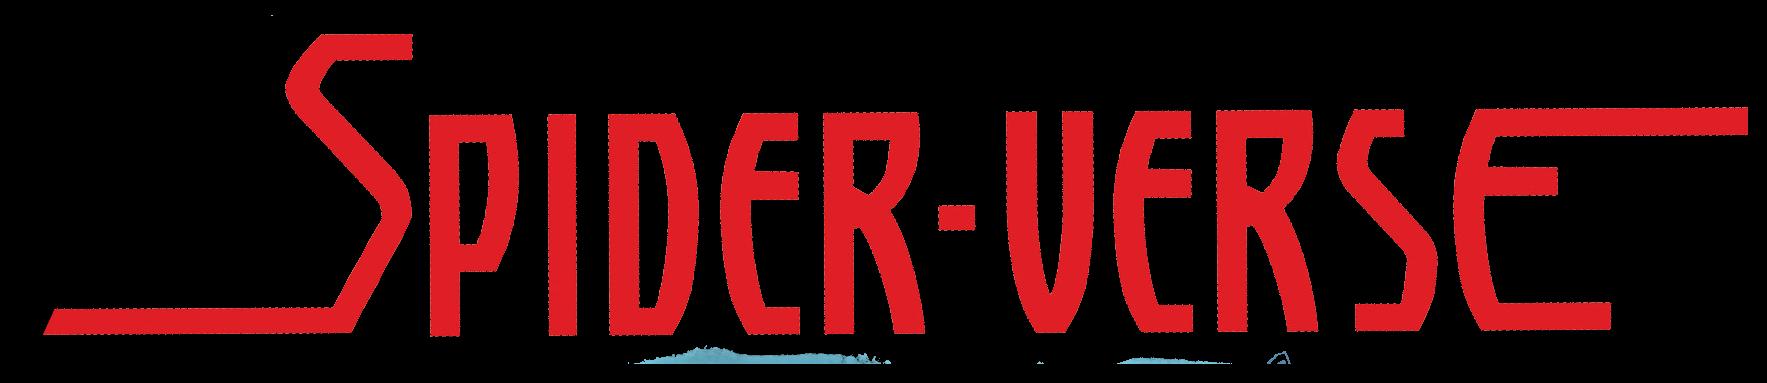 Verse Logo VIDEO: Should T...